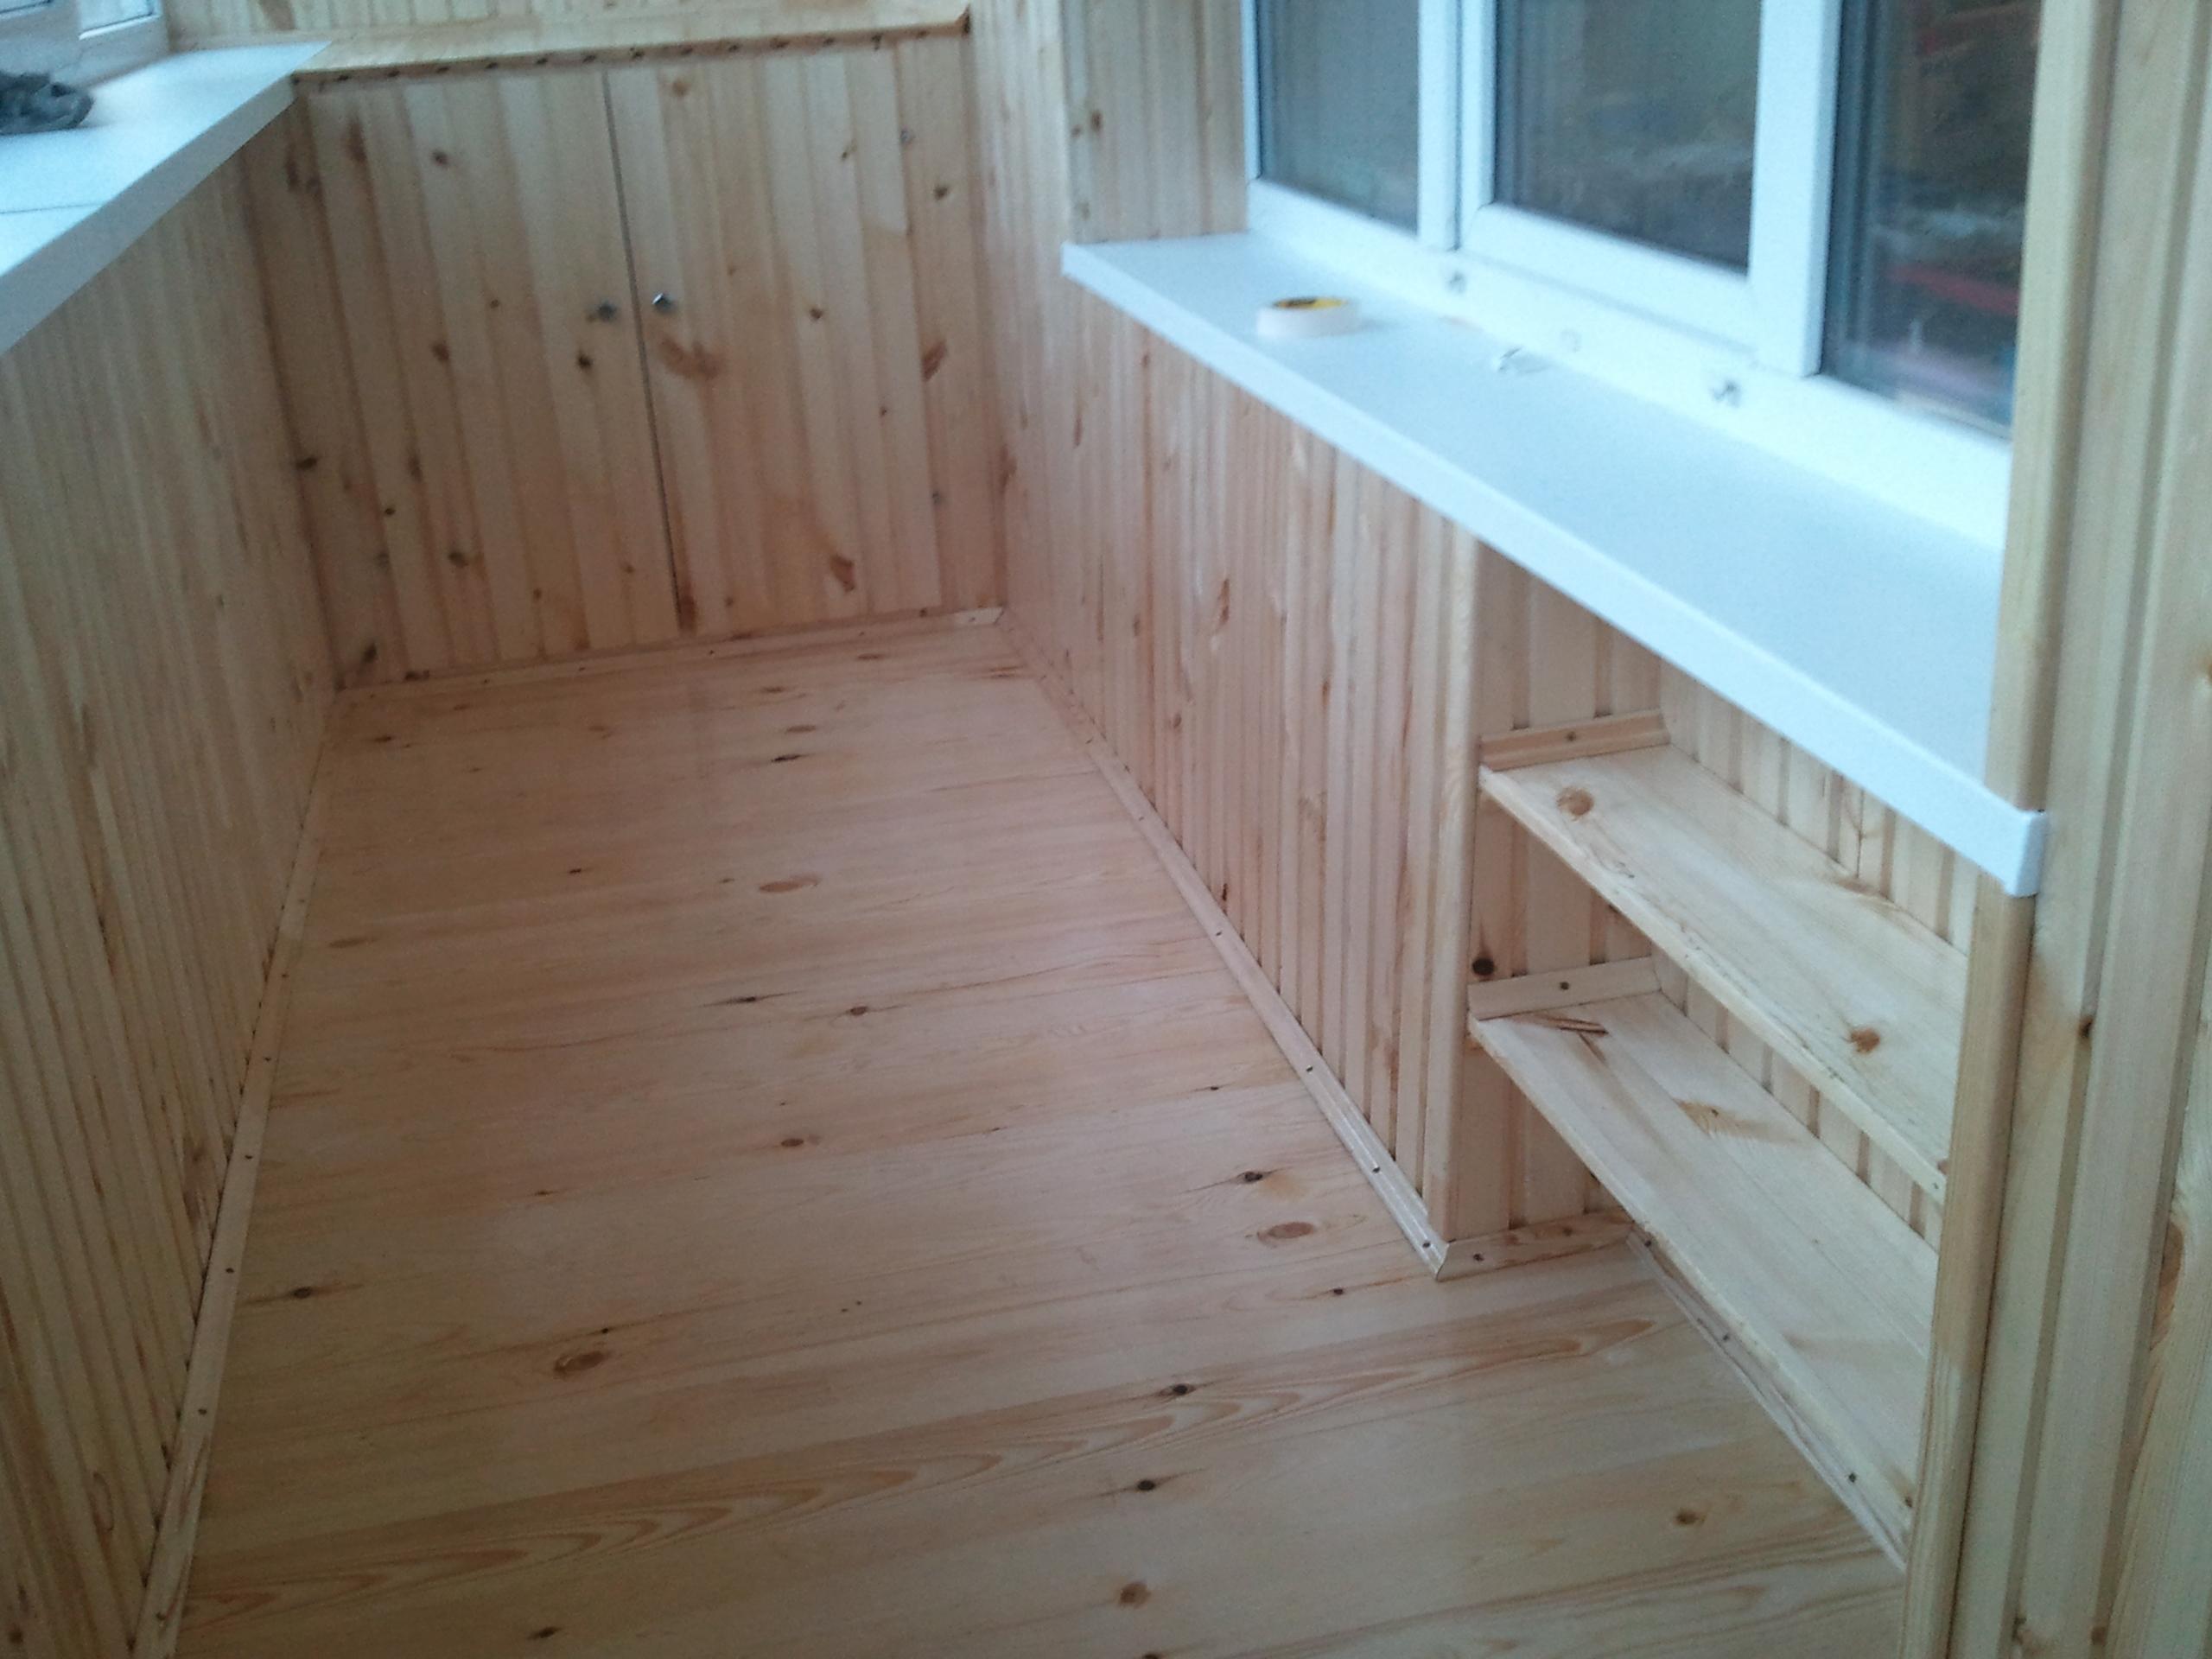 Мебель для балкона и лоджии в тюмени. цена товара от 3 800 д.